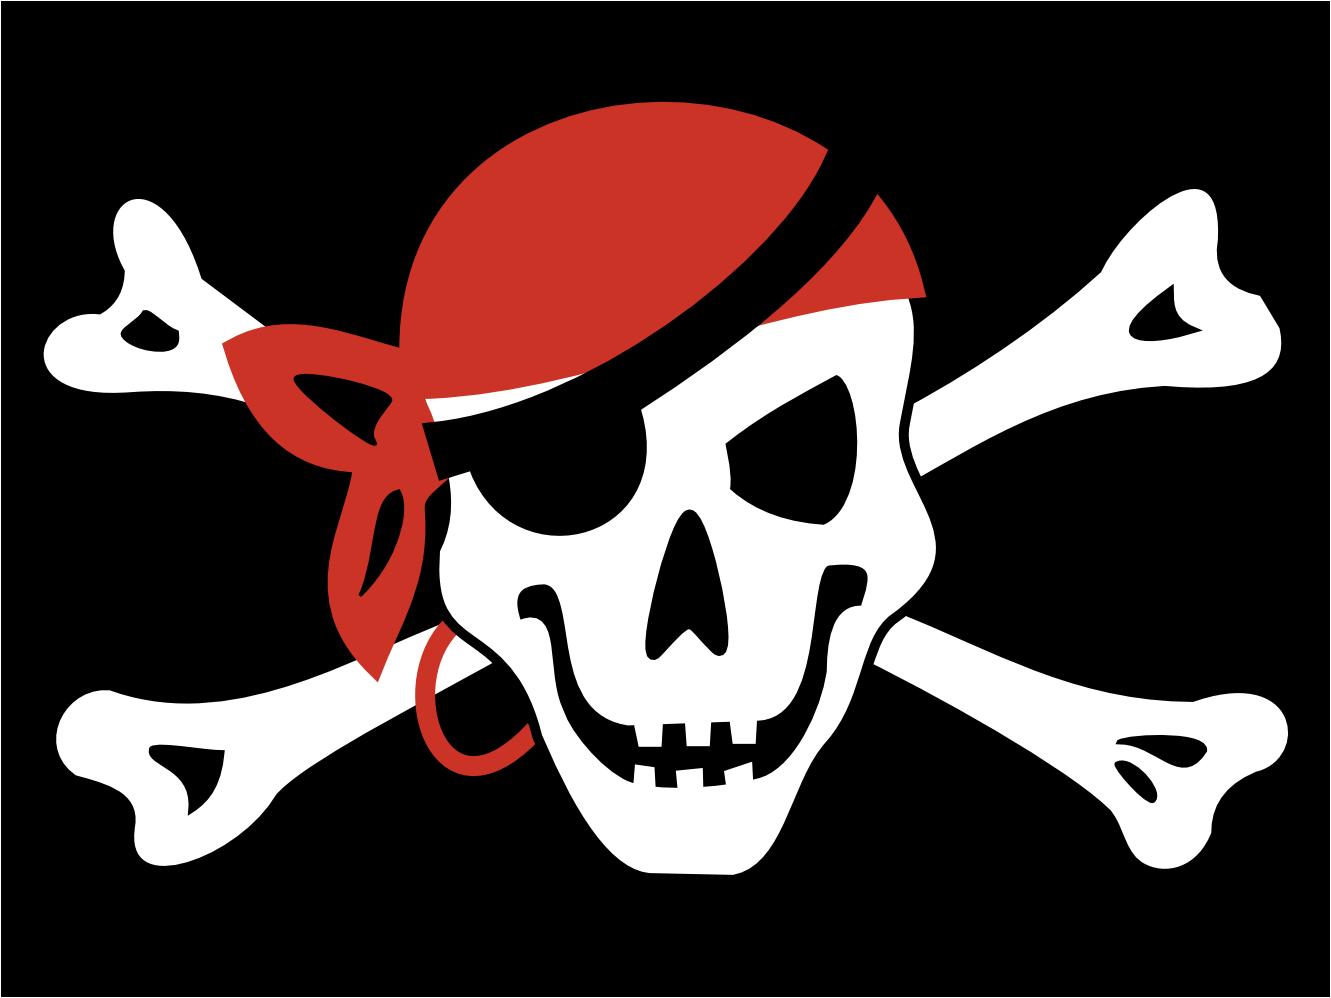 Clipart; Pirate Bandanna .-Clipart; Pirate Bandanna .-3